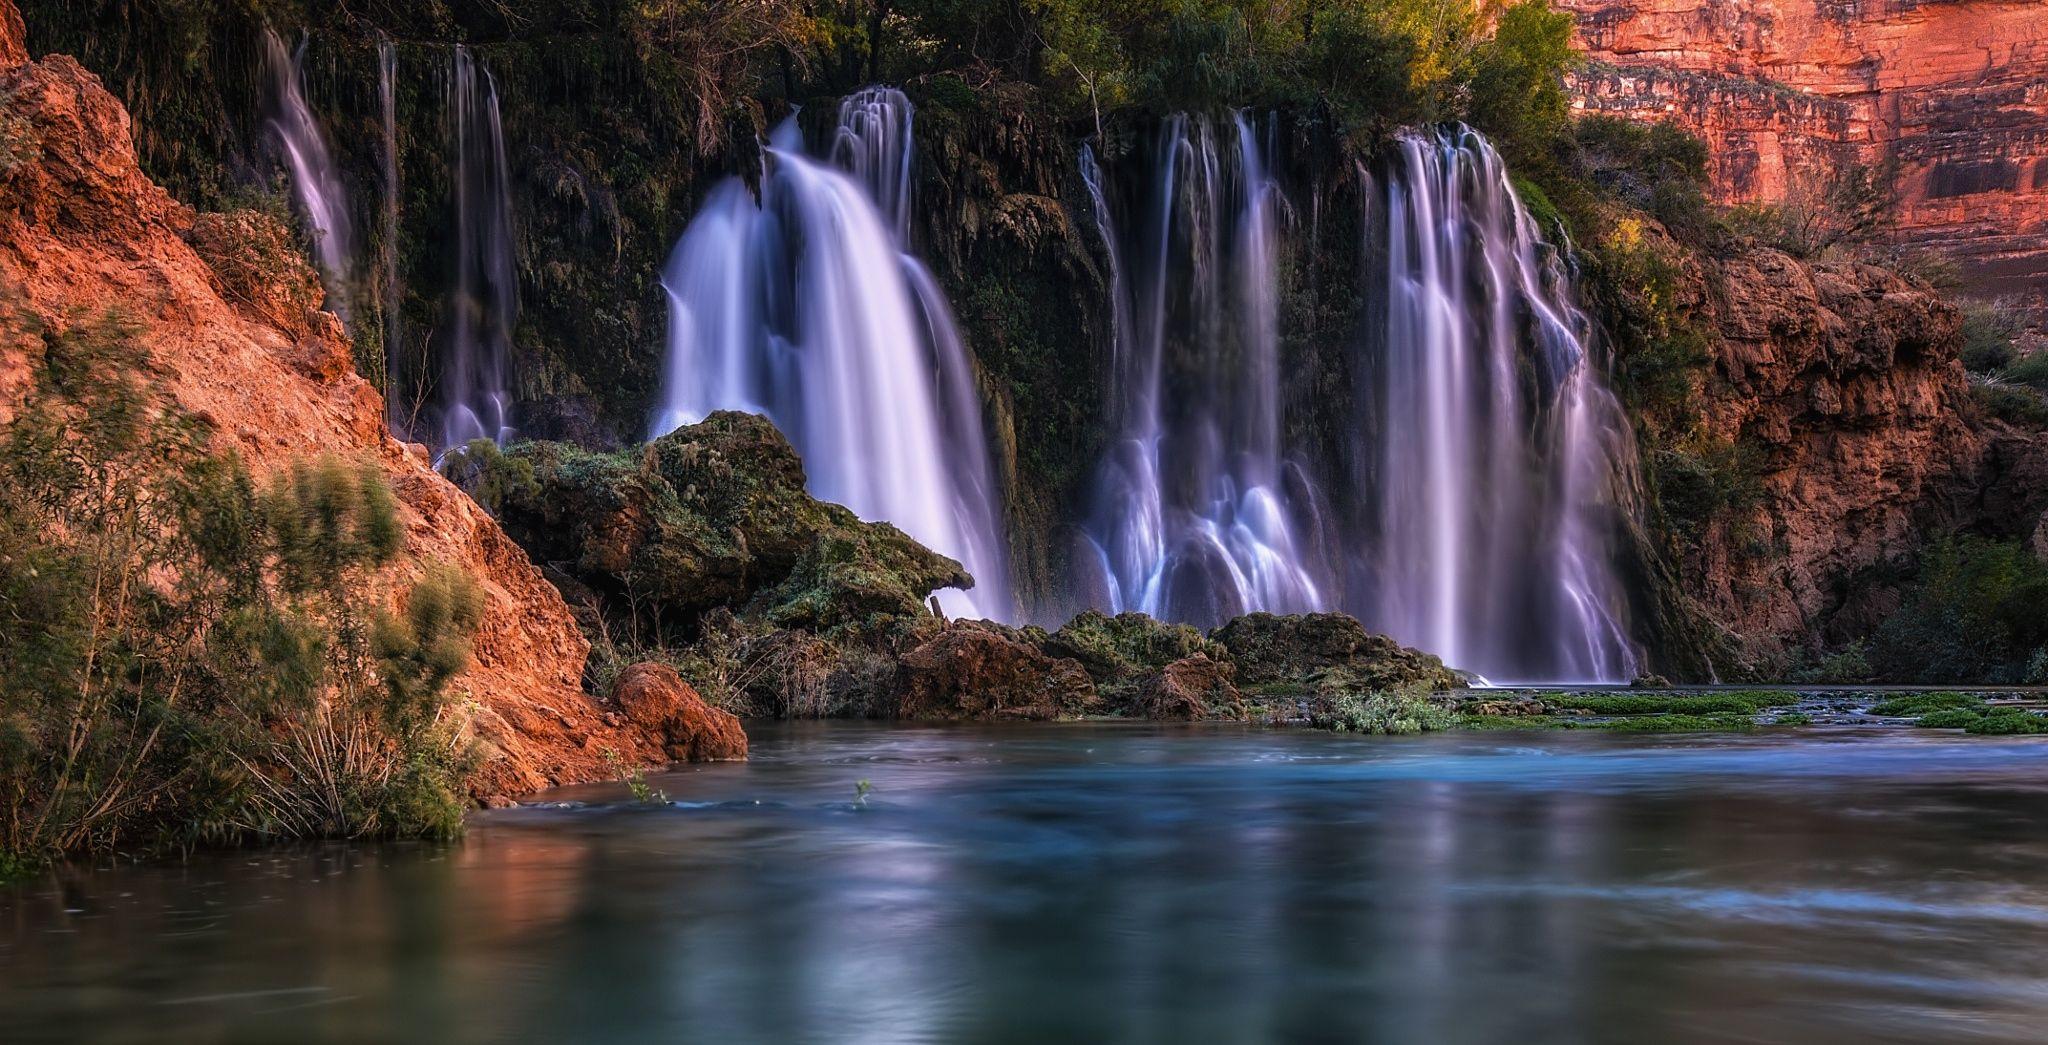 Aquamarine - The wonderful aquamarine colors of Havasu Falls ...